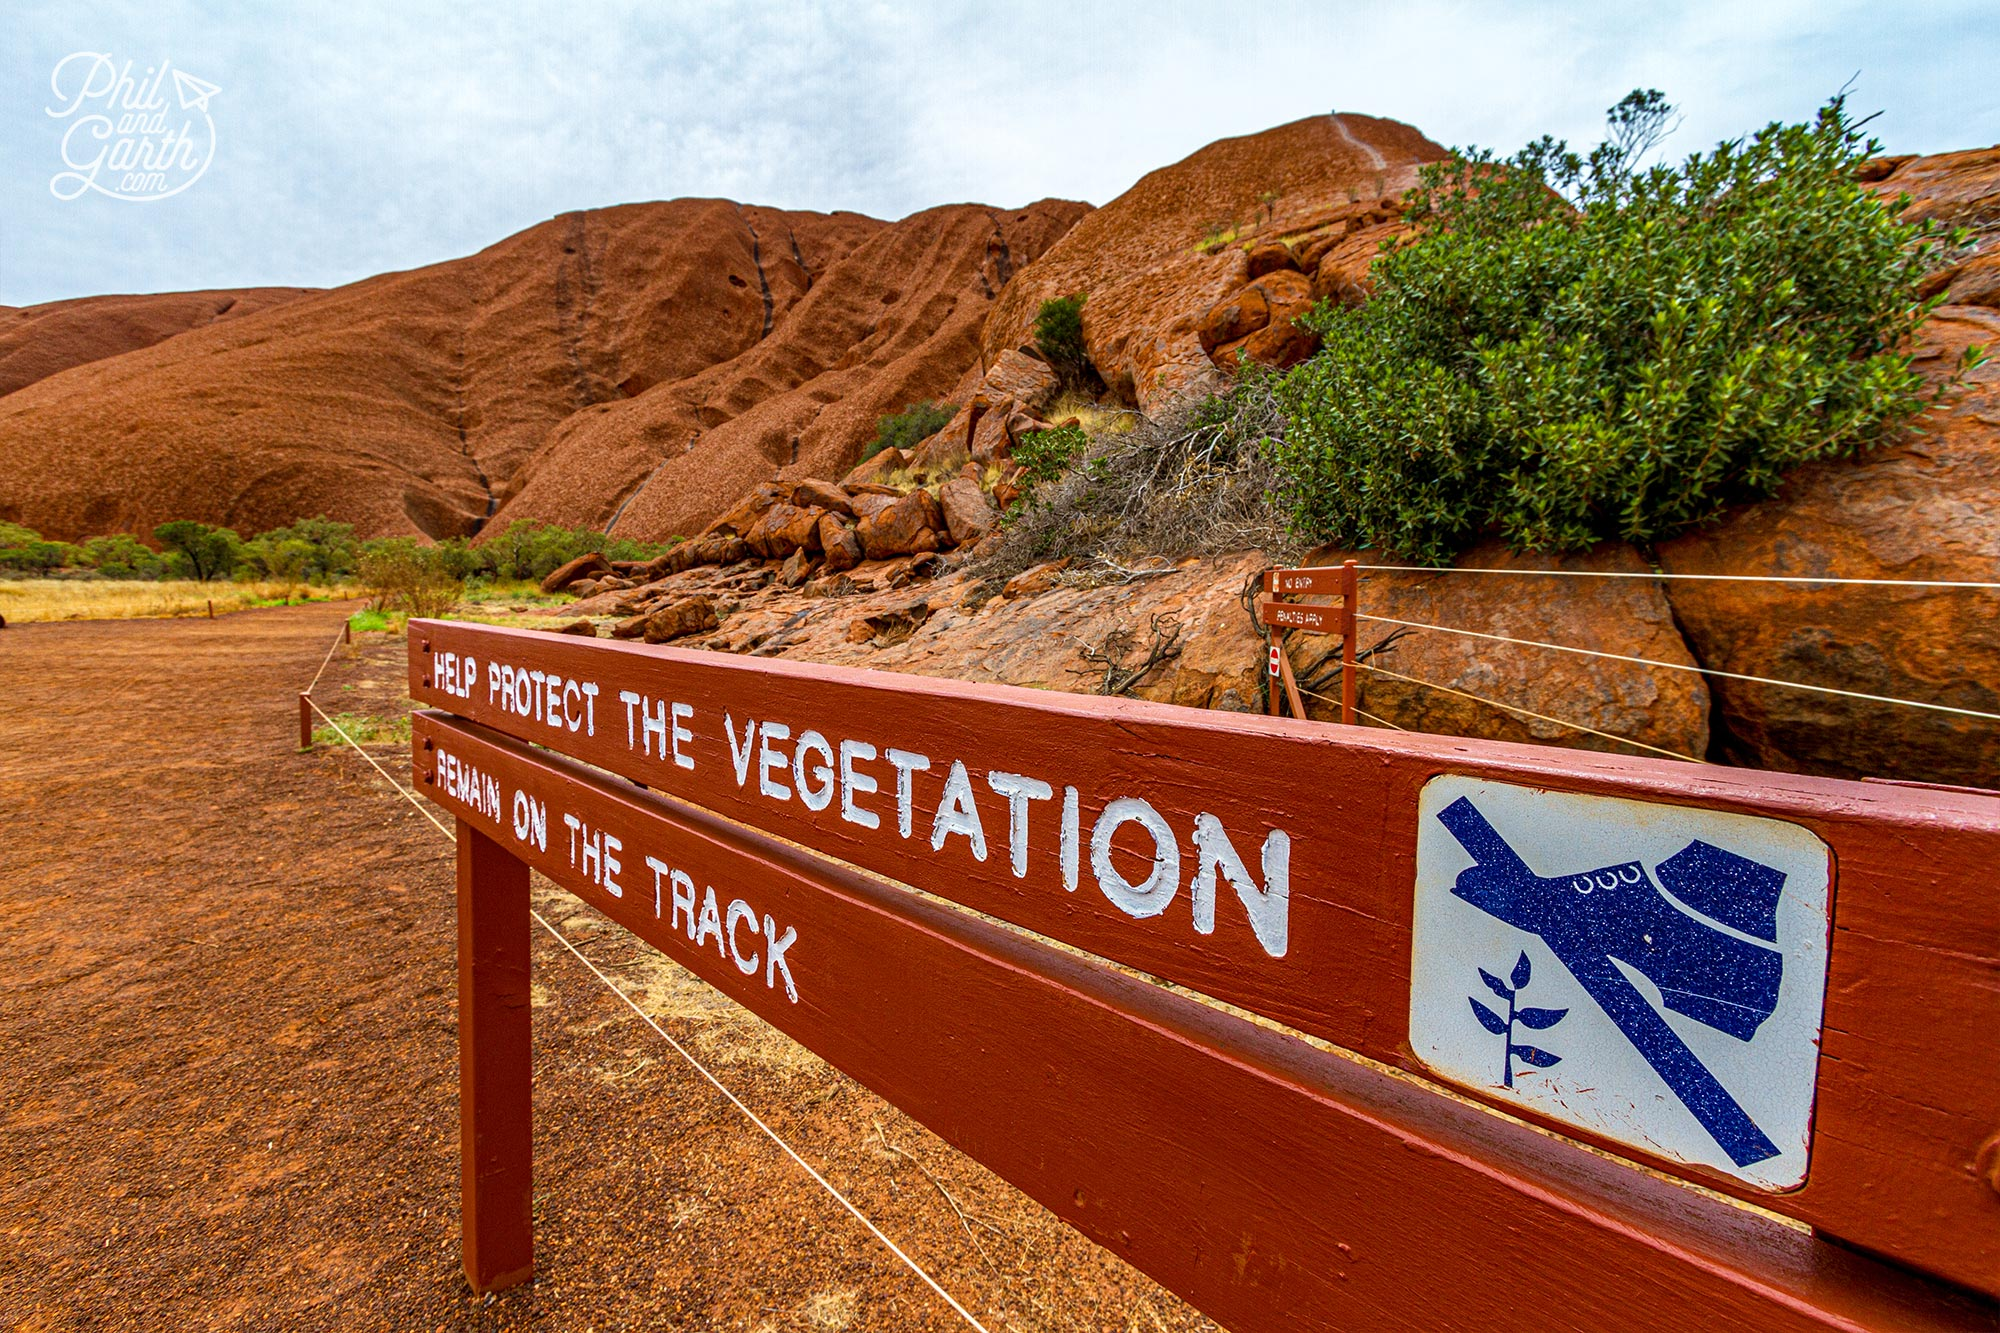 From the Mala car park take the 6 mile circular base walk around Uluru